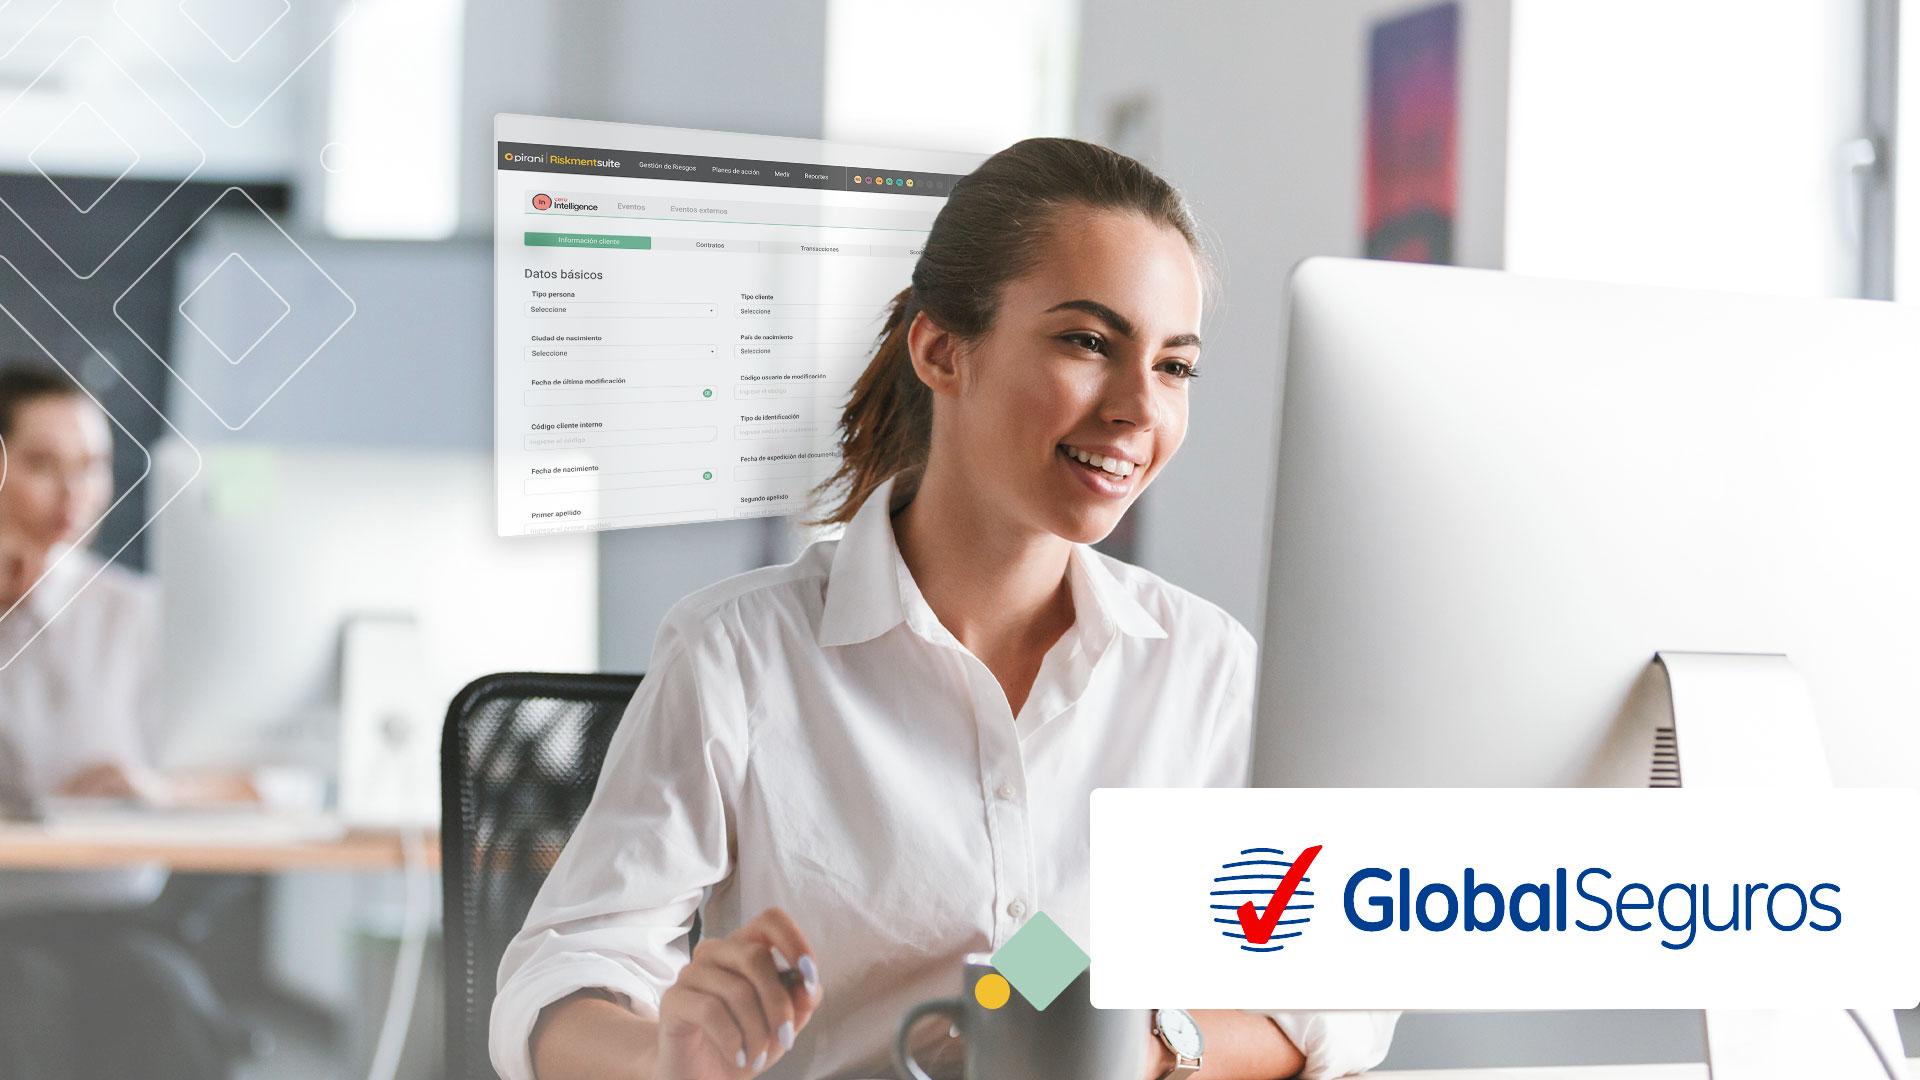 t_global_seguros